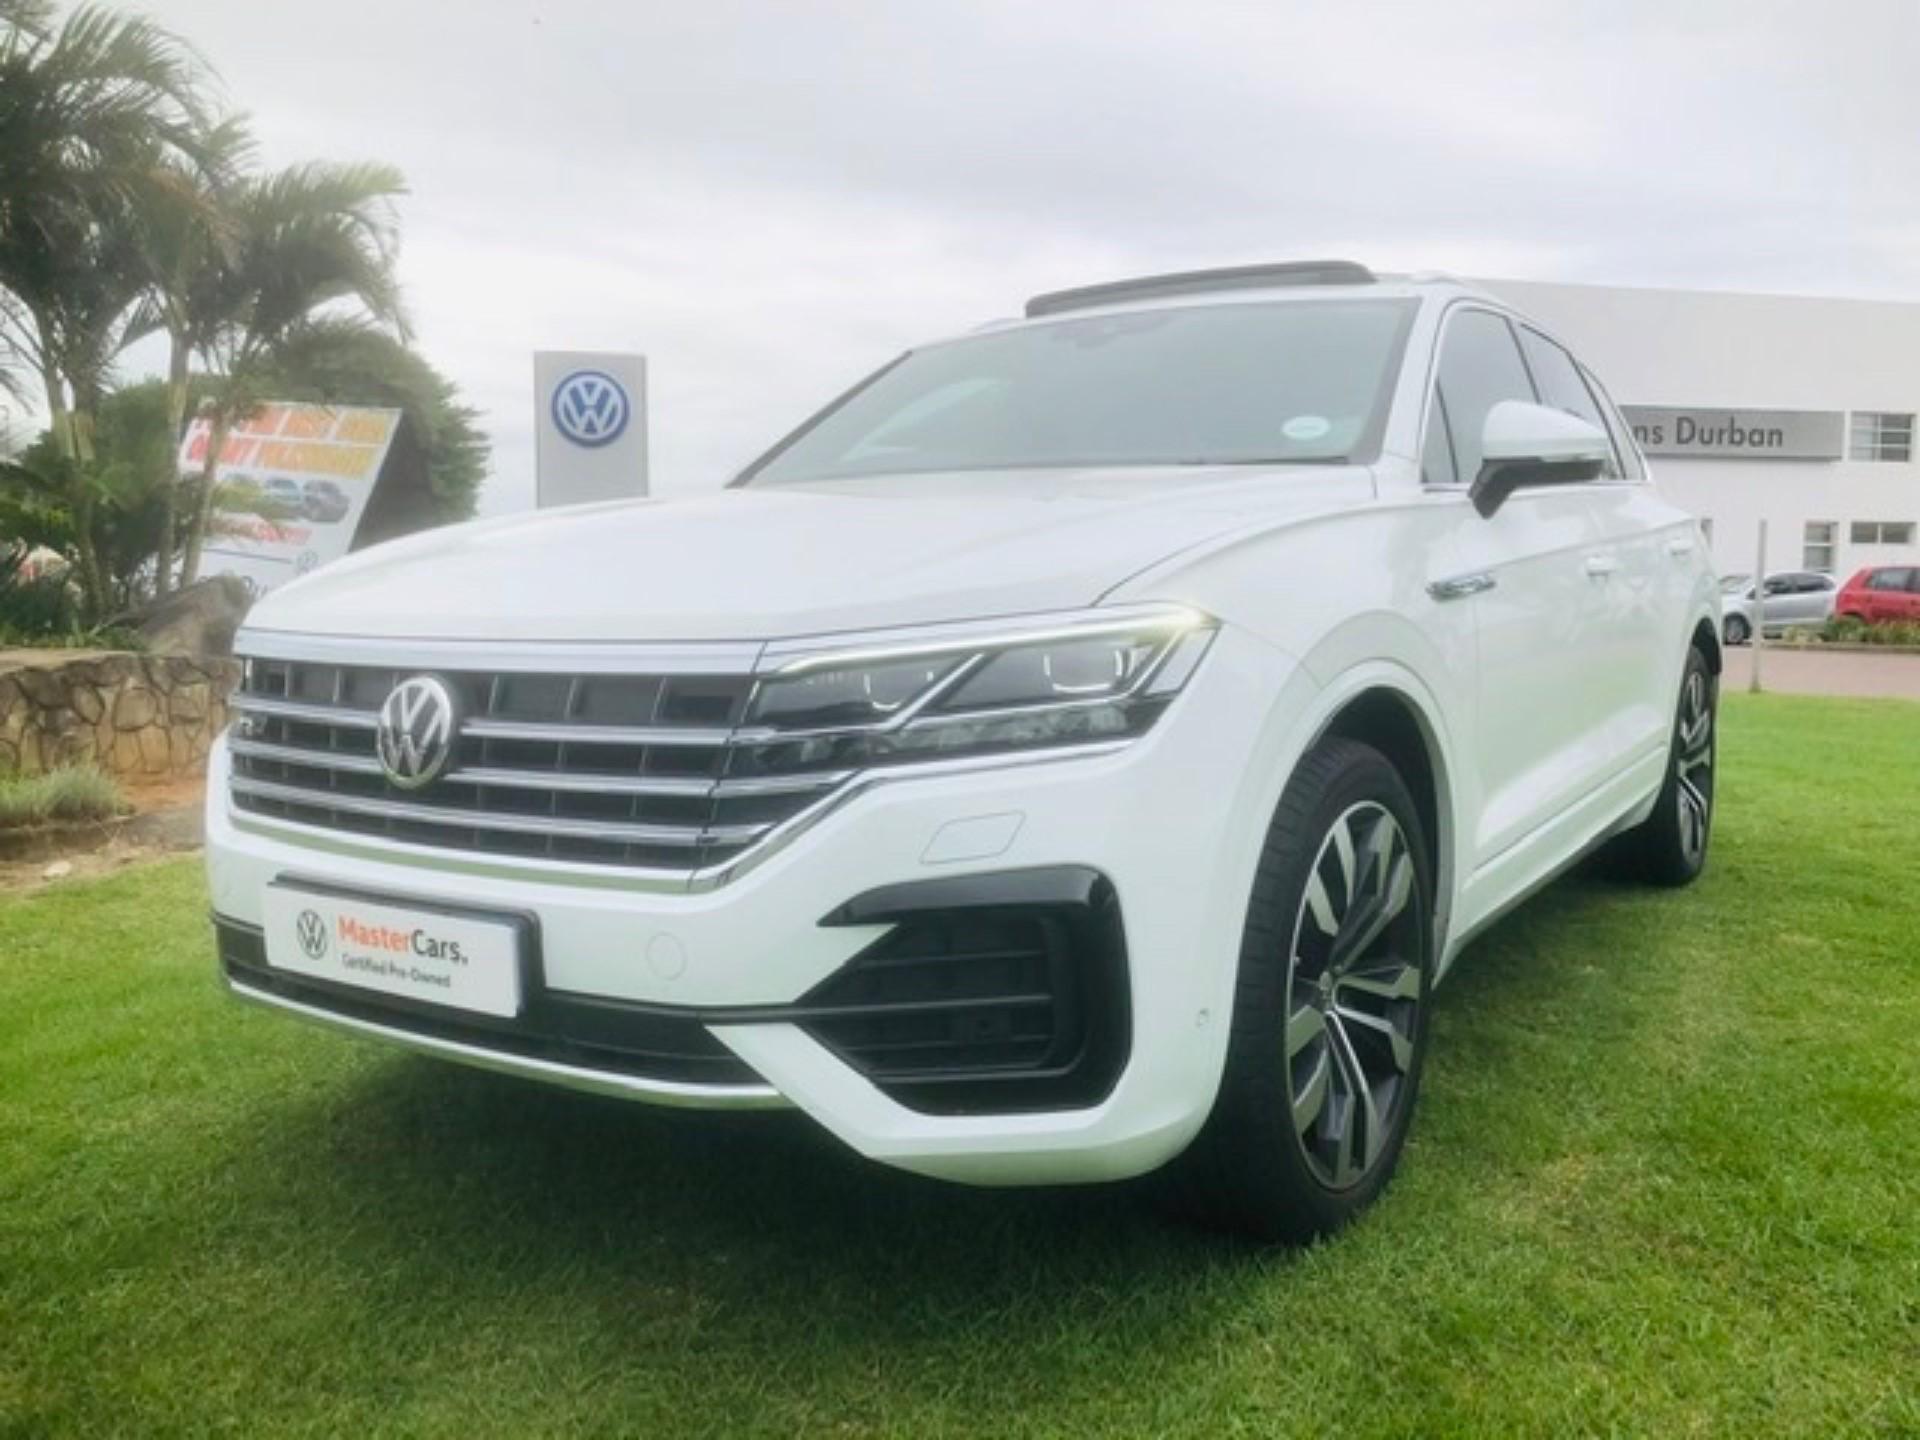 2019 VOLKSWAGEN TOUAREG 3.0 TDI V6 EXECUTIVE